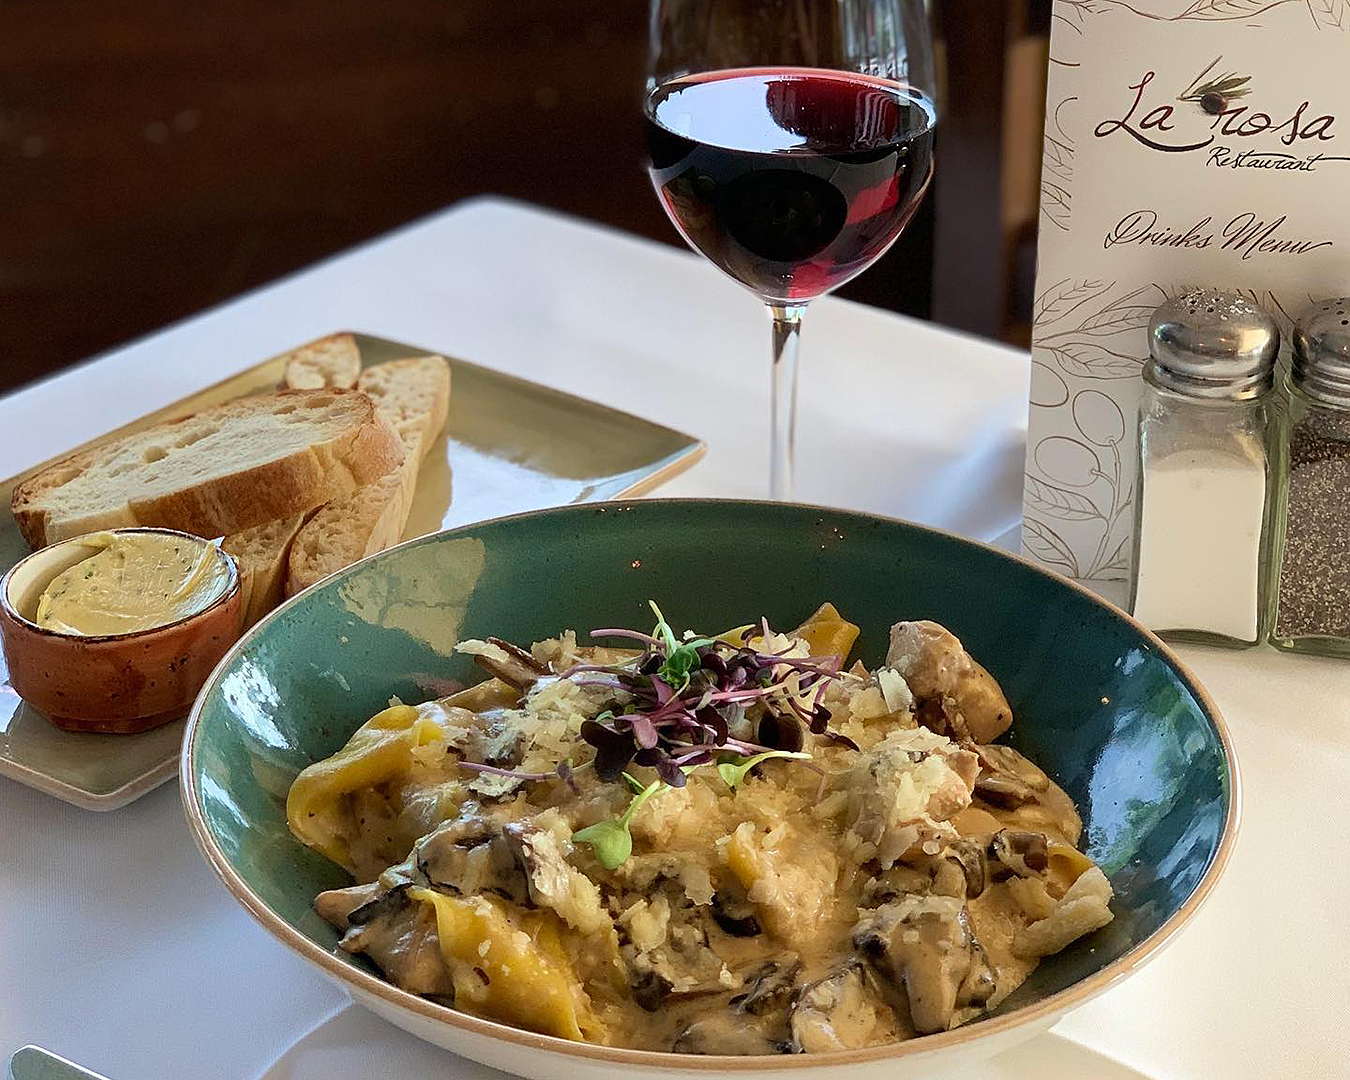 Wine & Pasta at La Rosa